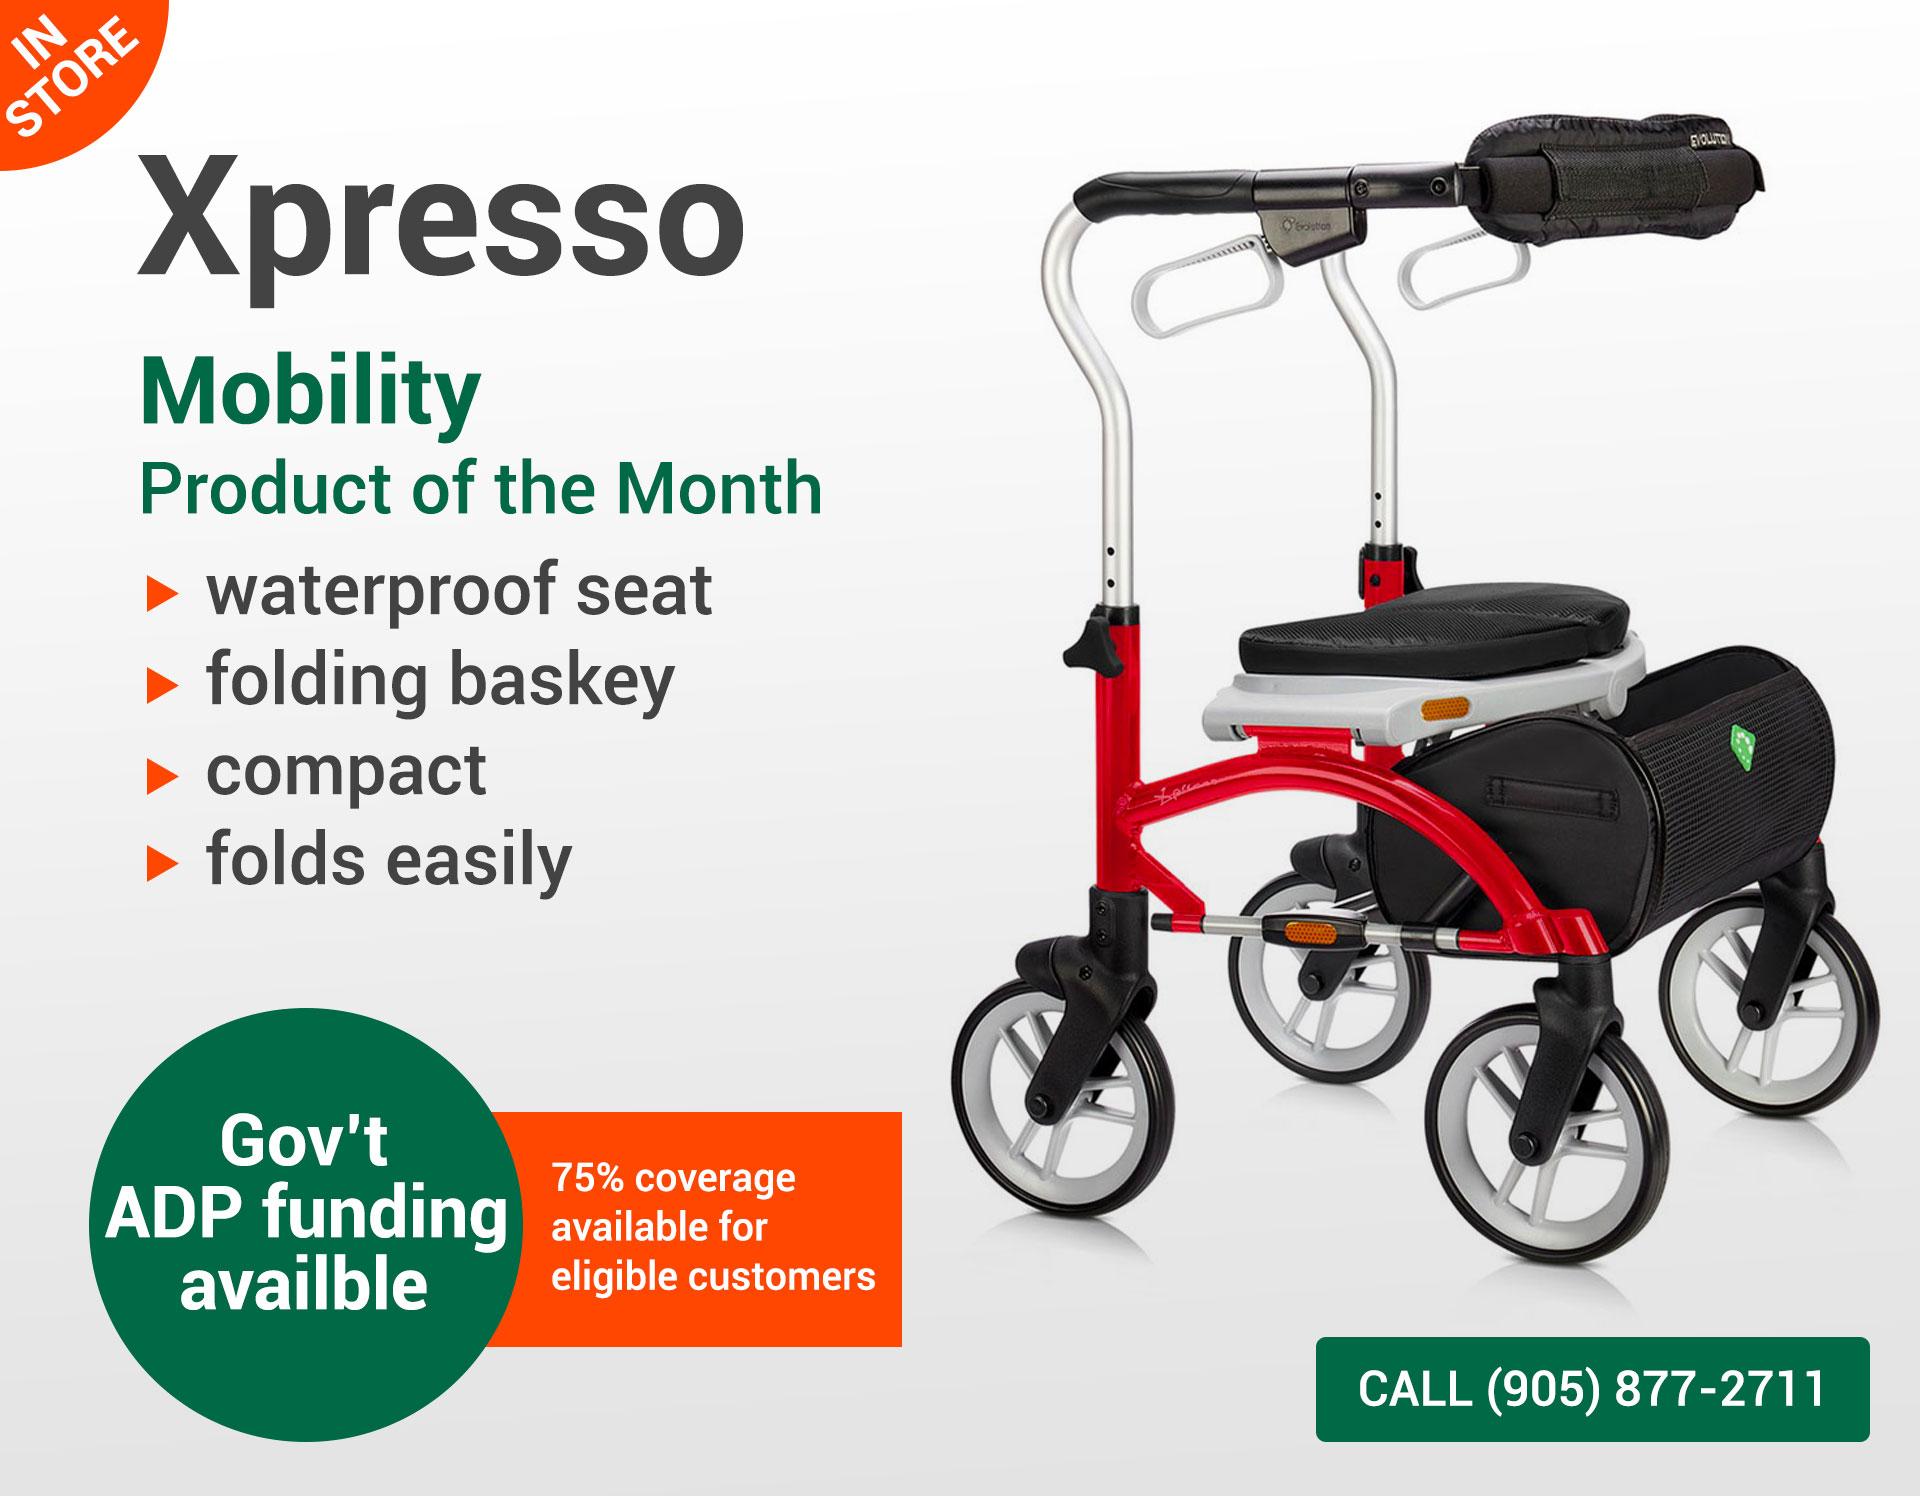 Xpresso Mobility